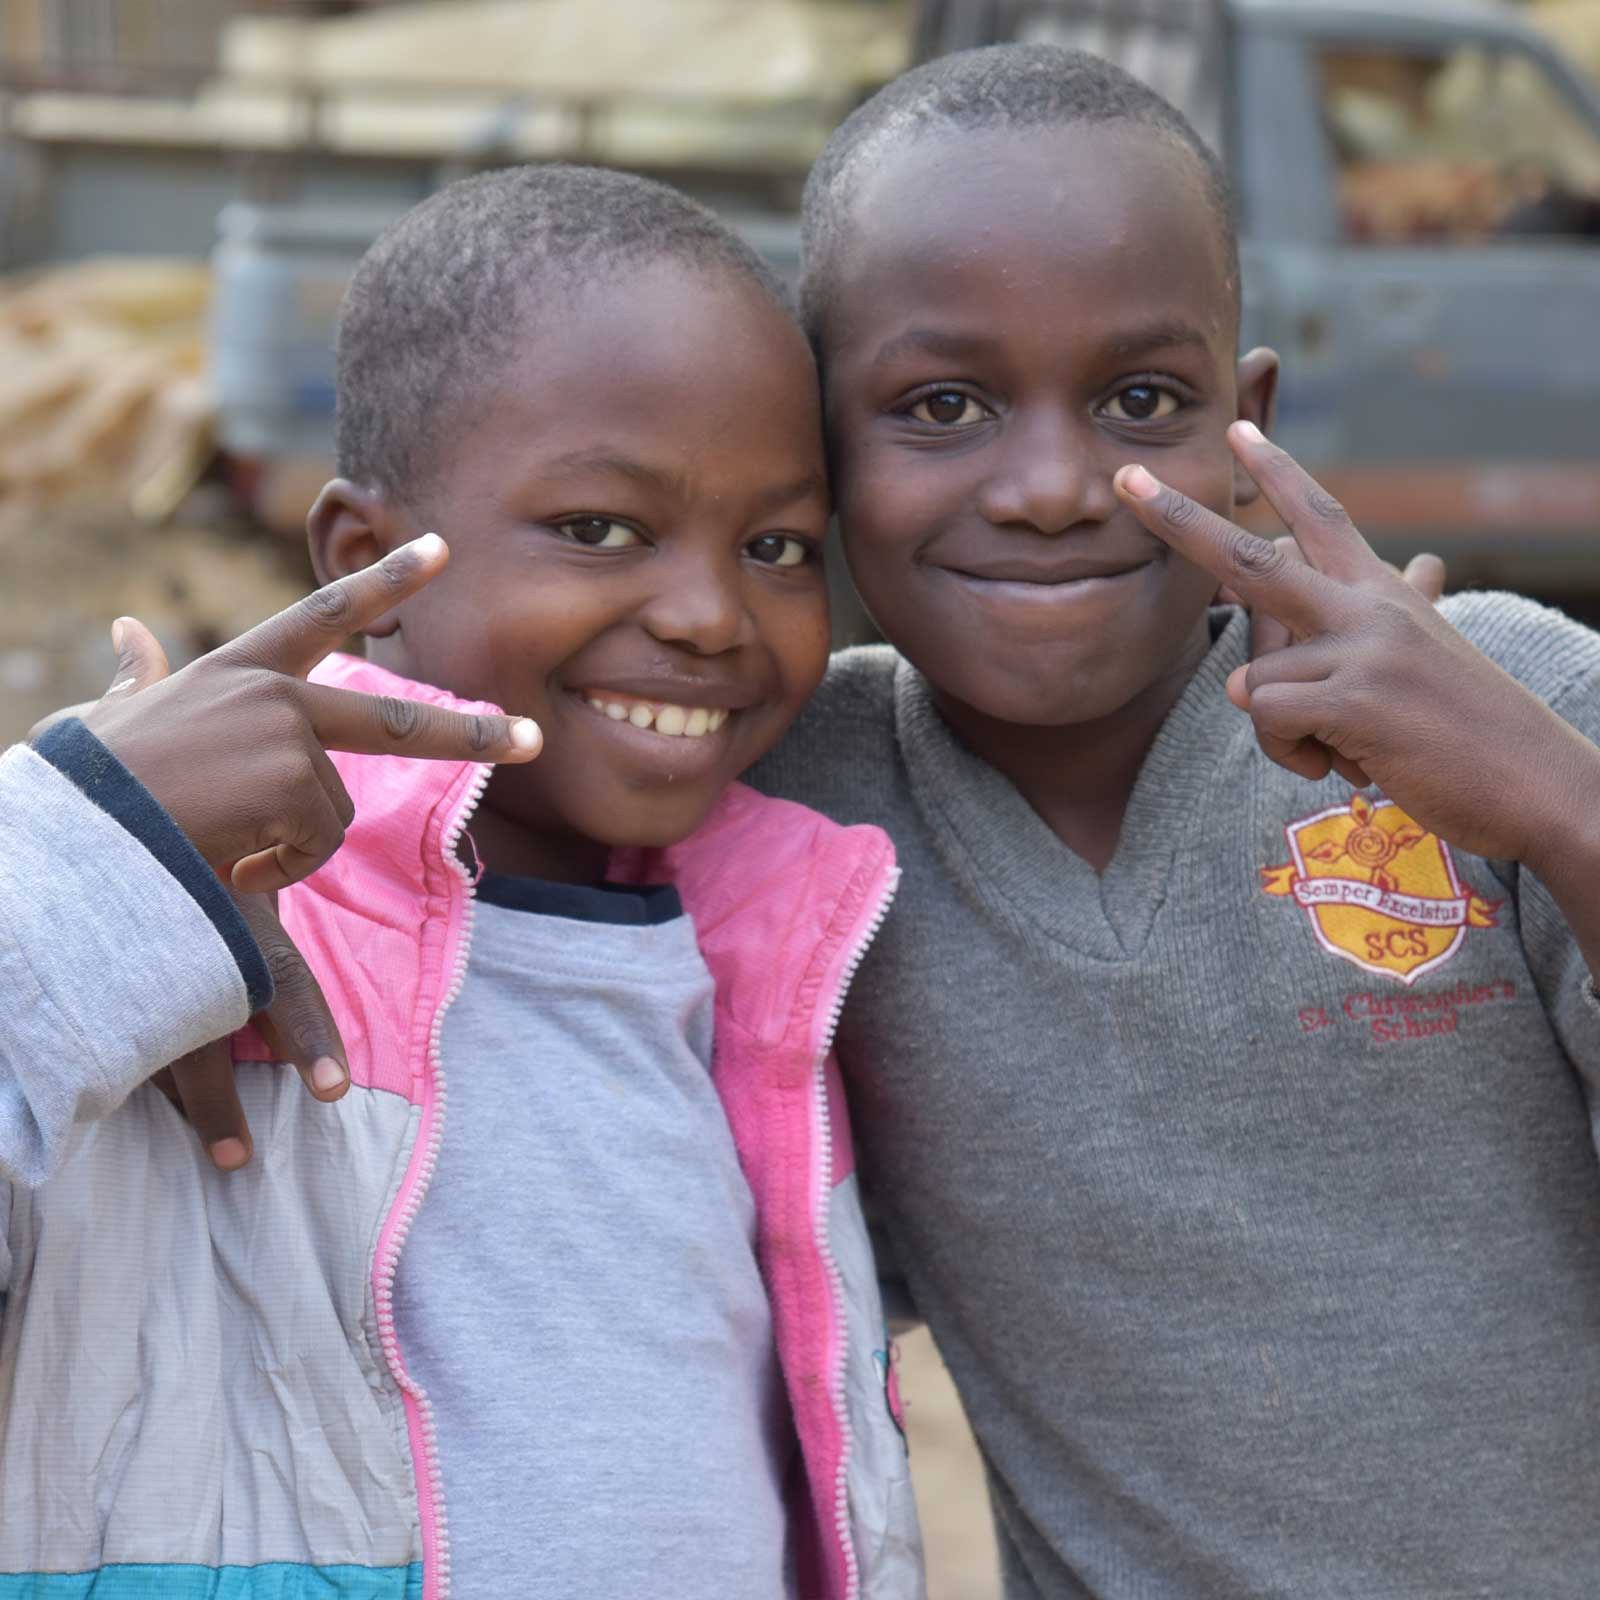 Boys playfully display peace sign